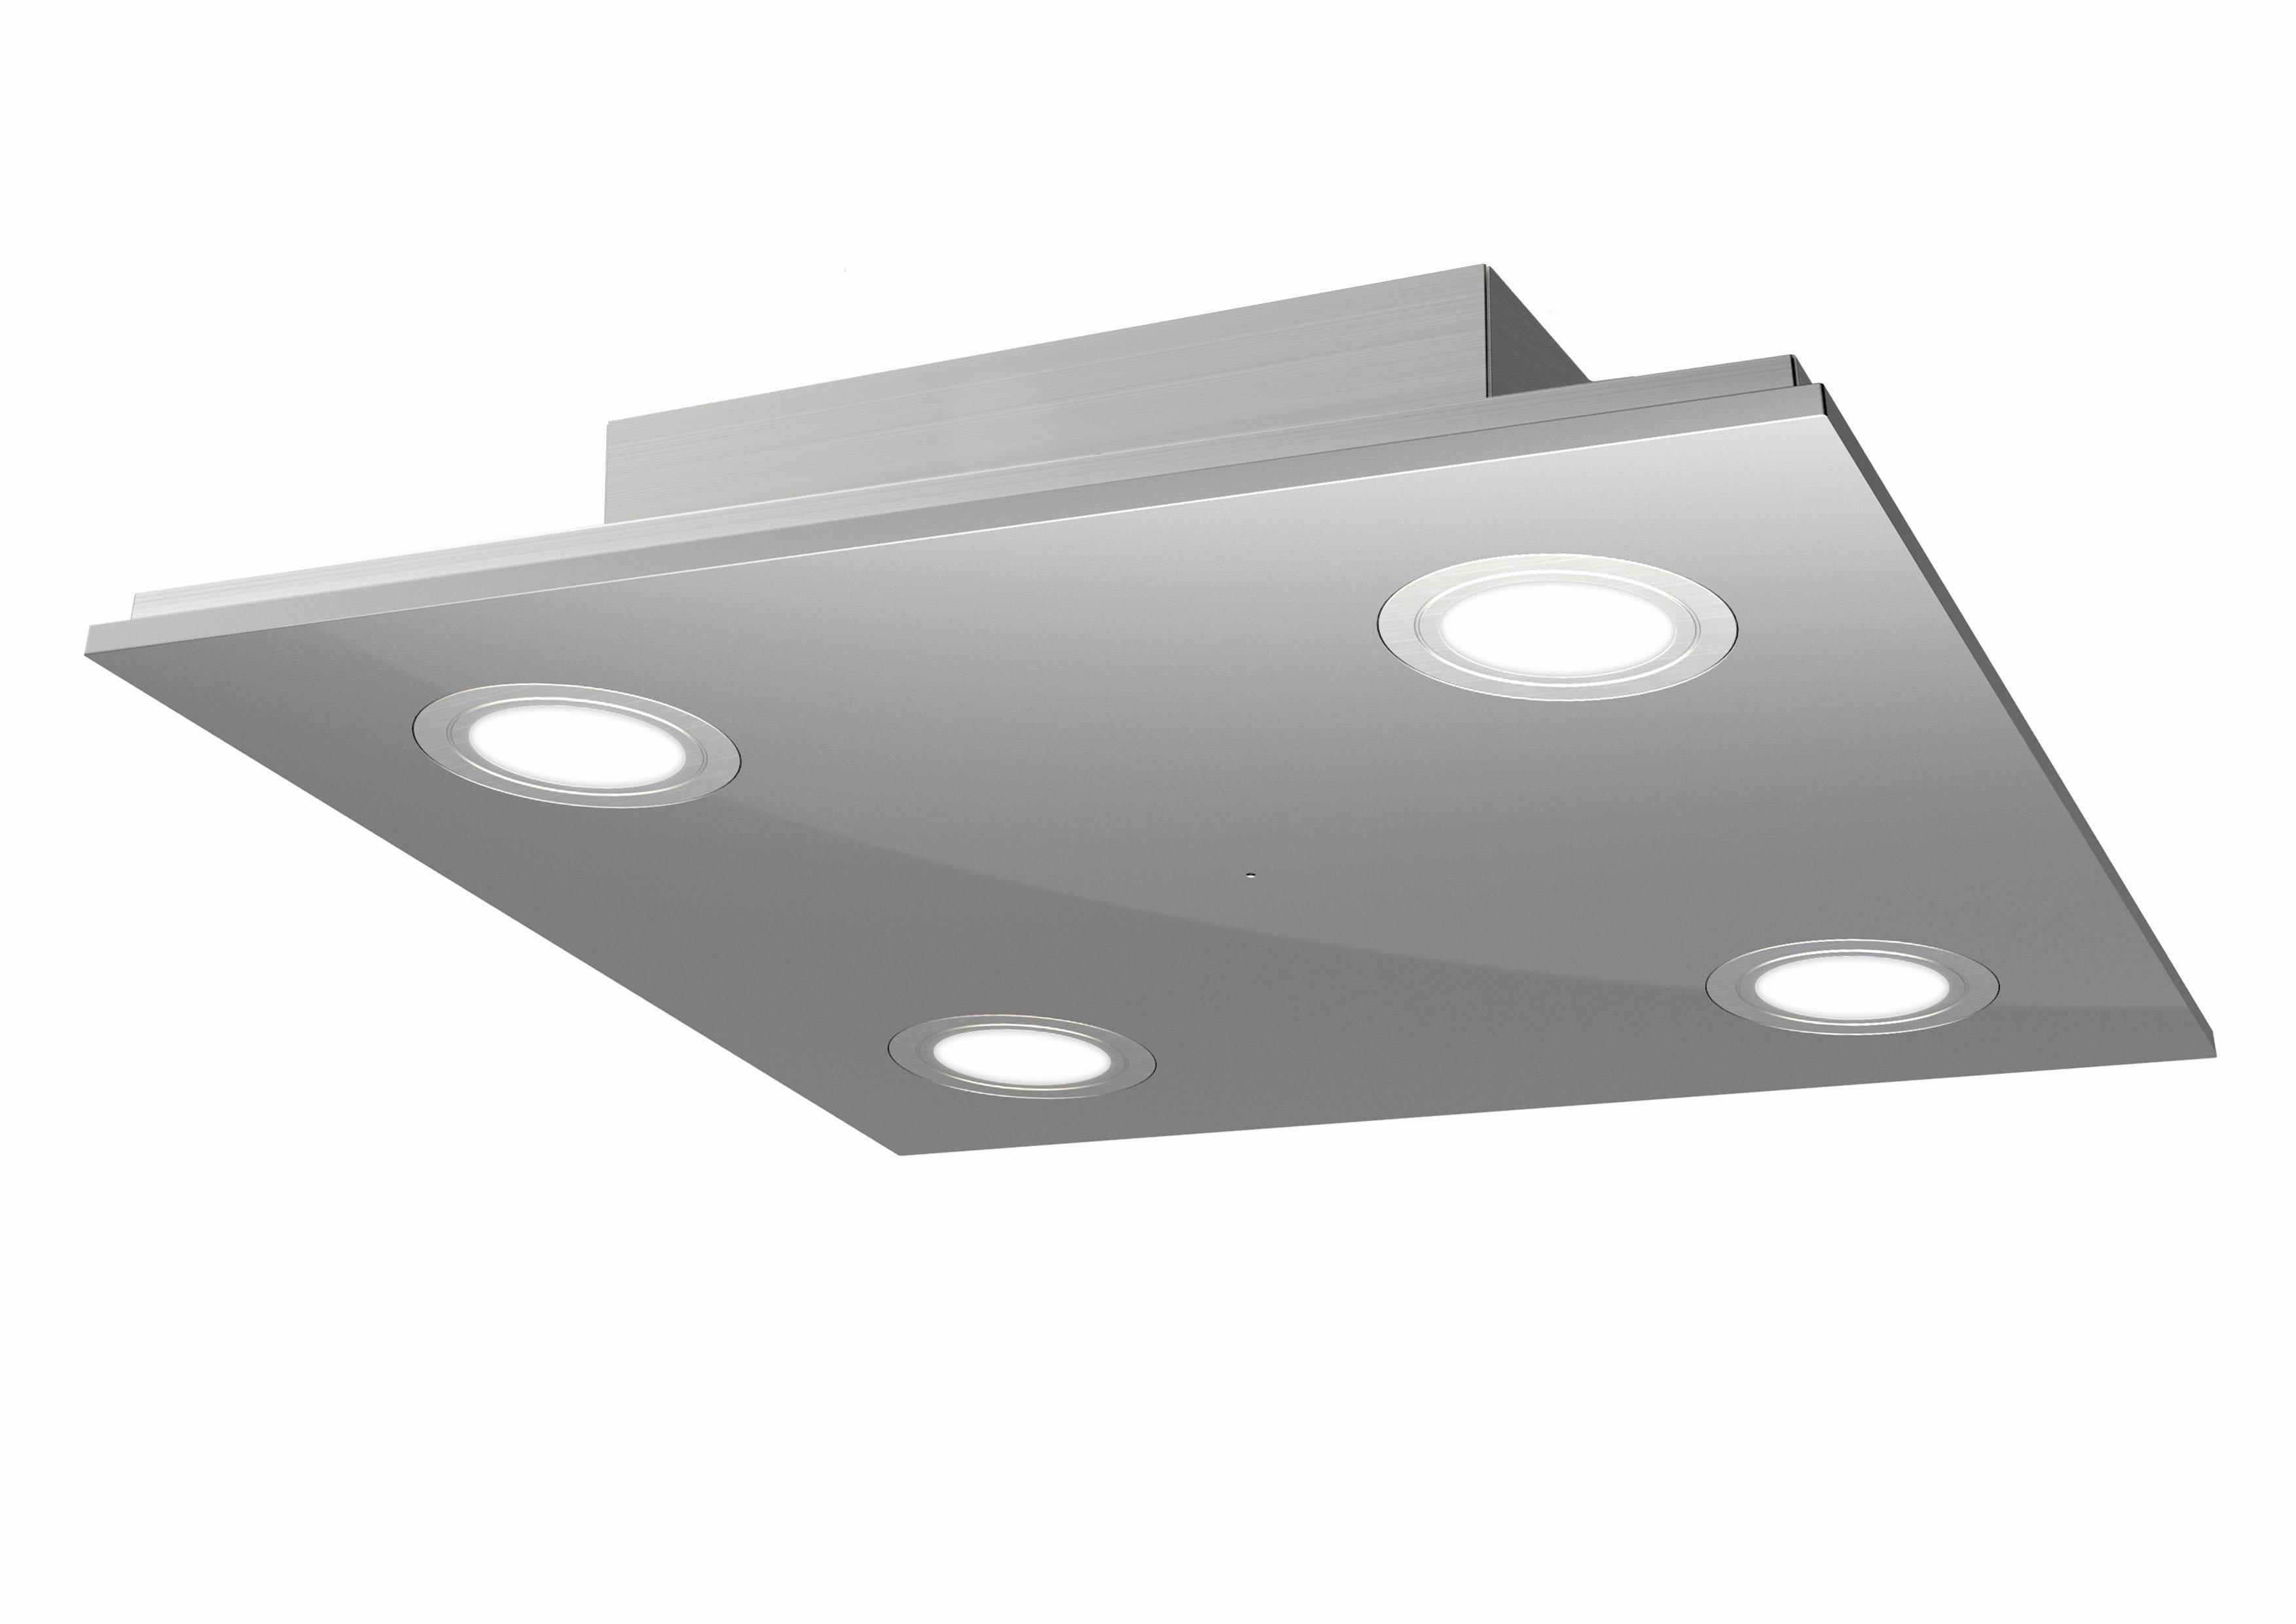 EVOTEC LED-Deckenleuchte, 4-flg., »PANO« | Lampen > Deckenleuchten > Deckenlampen | Edelstahl | EVOTEC